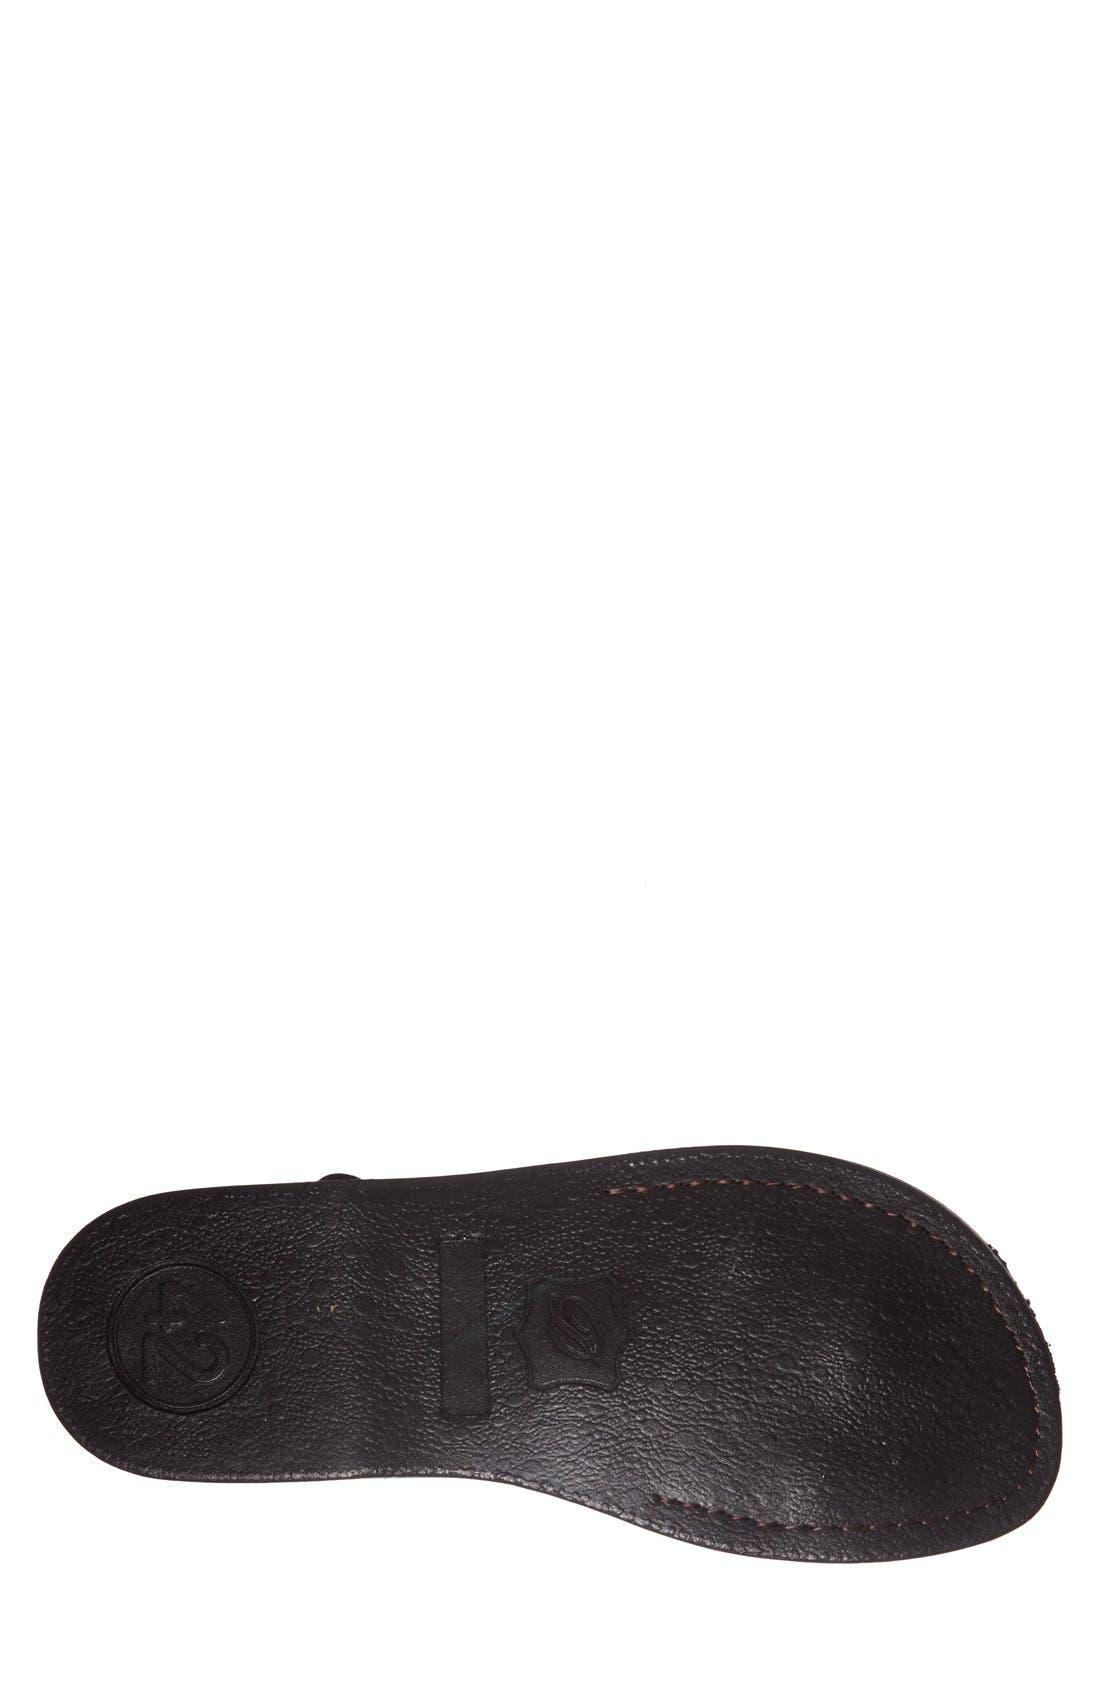 JERUSALEM SANDALS, 'The Good Shepherd' Leather Sandal, Alternate thumbnail 3, color, BLACK